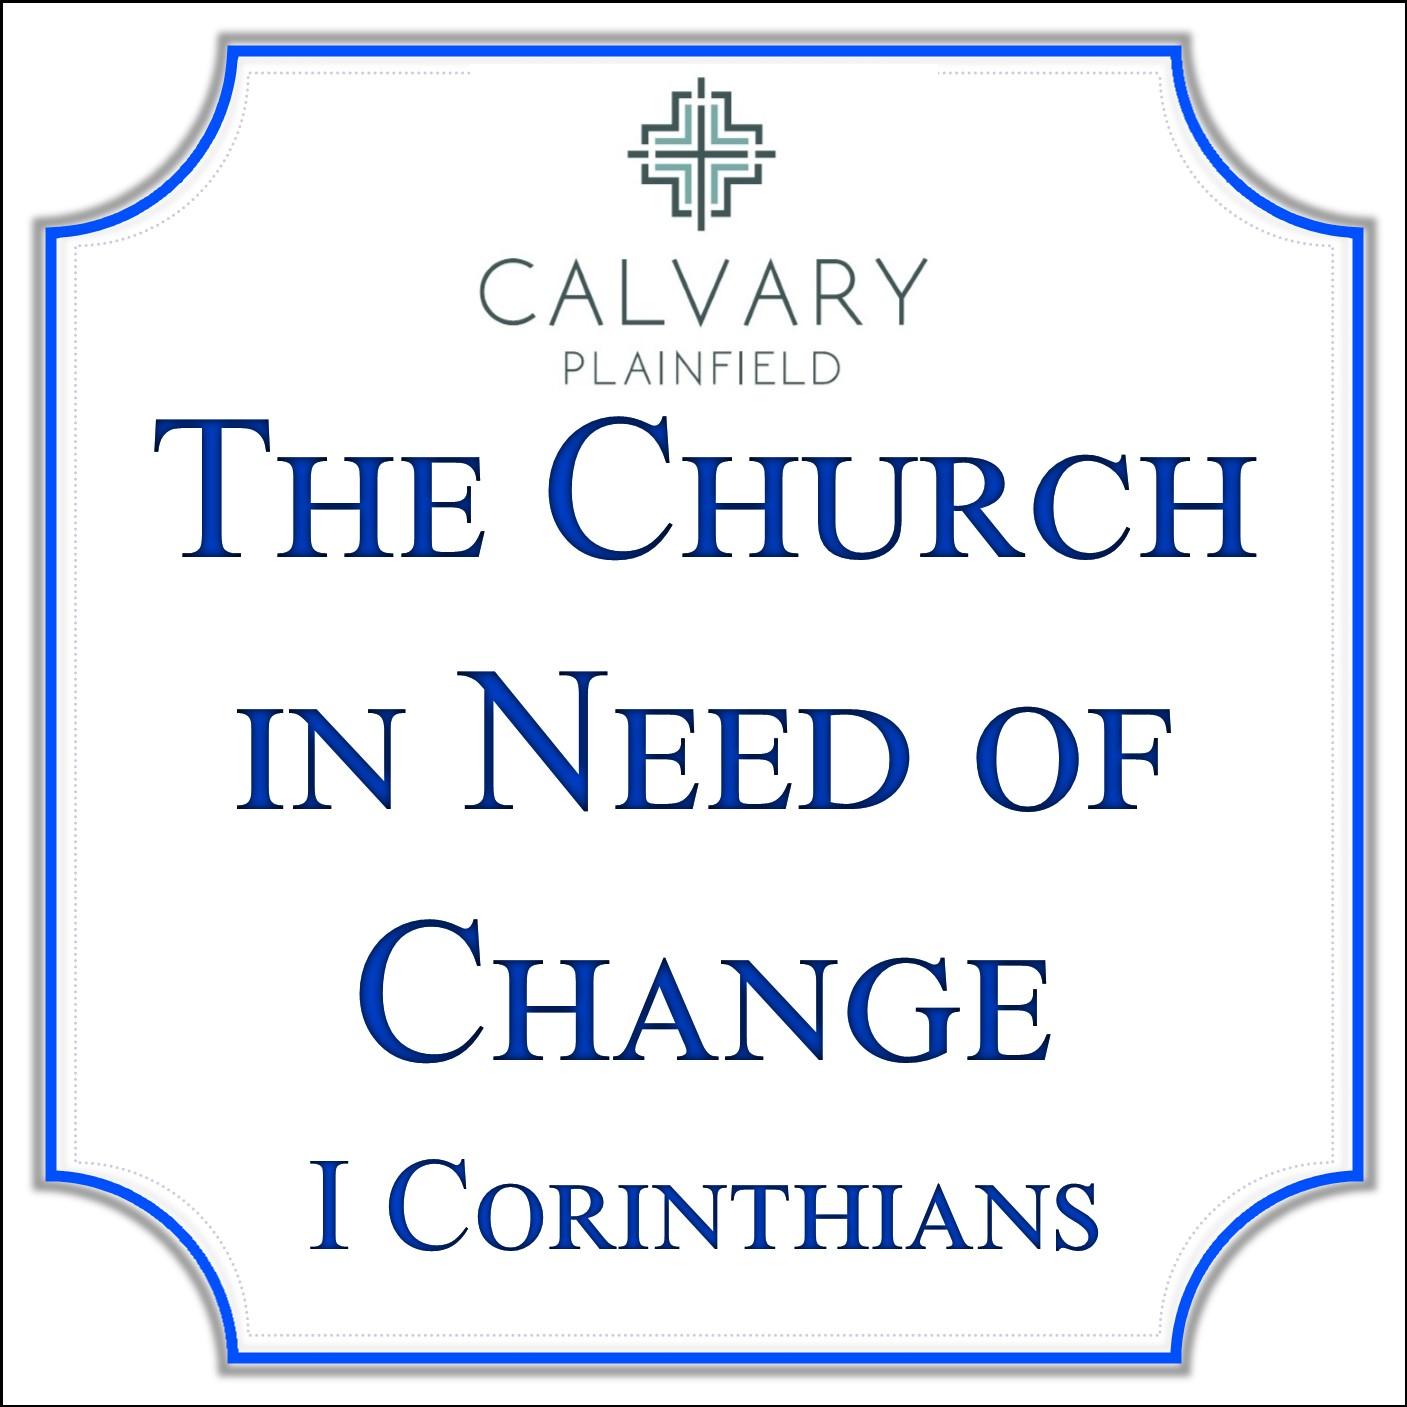 The Church in Need of Change - I Corinthians Series.jpg